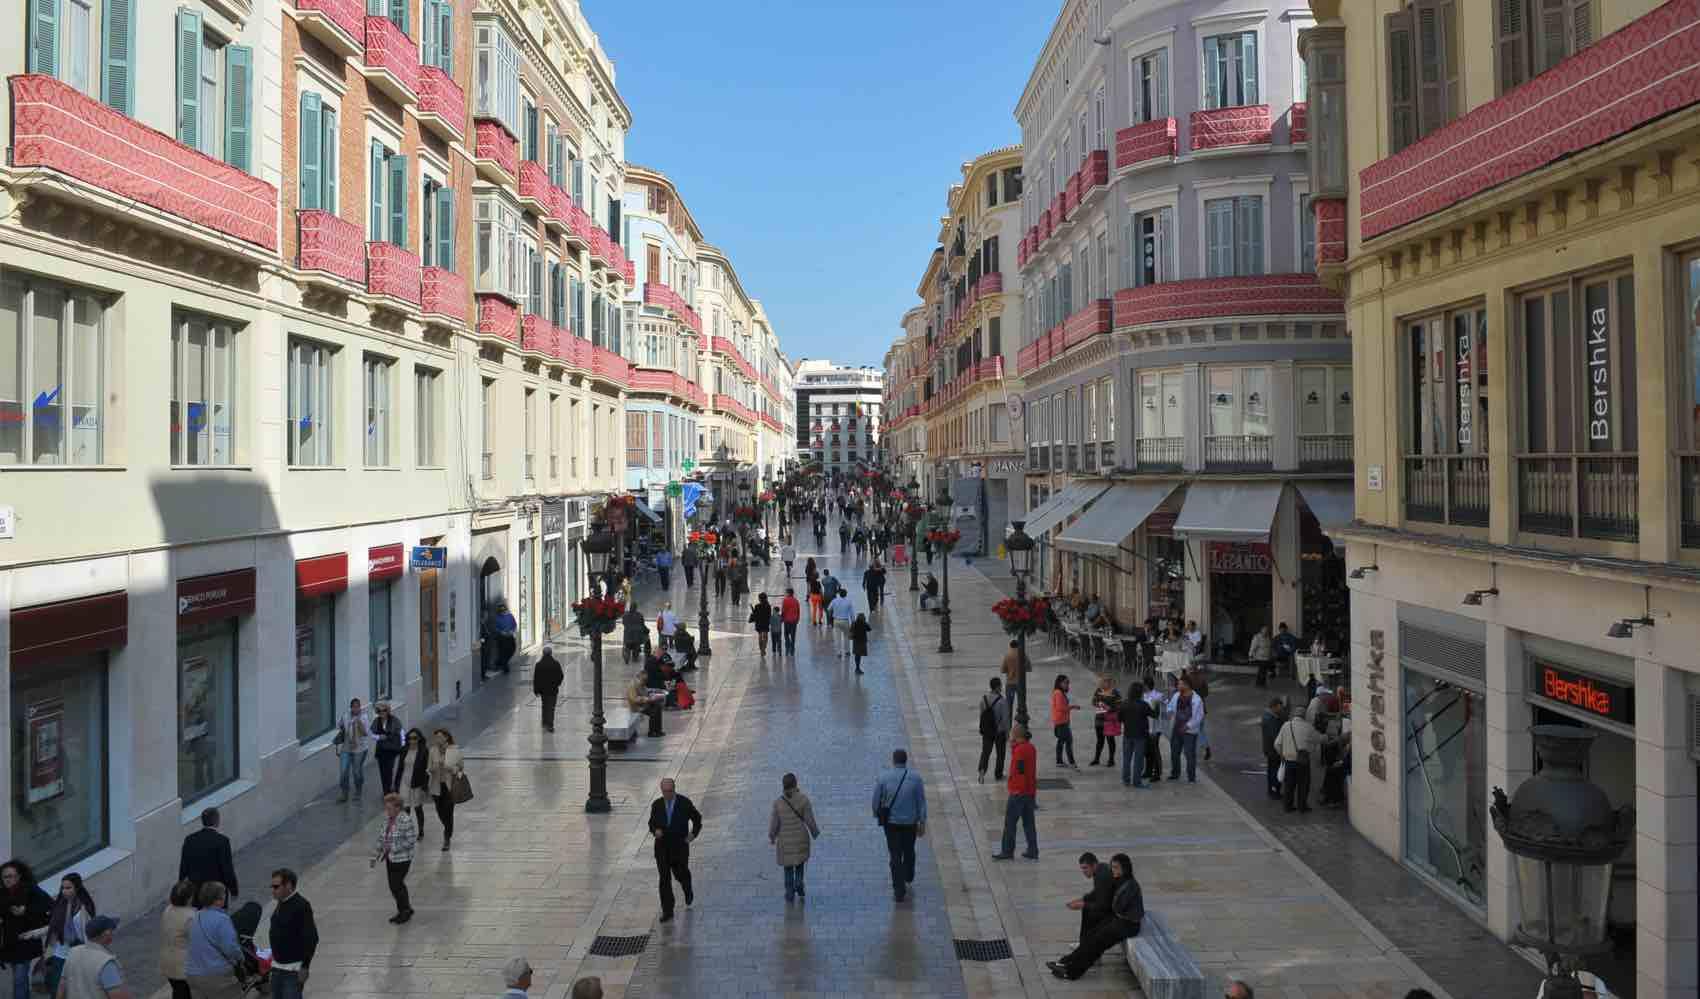 Calle Larios, the elegant main walking street in the centre of Malaga City